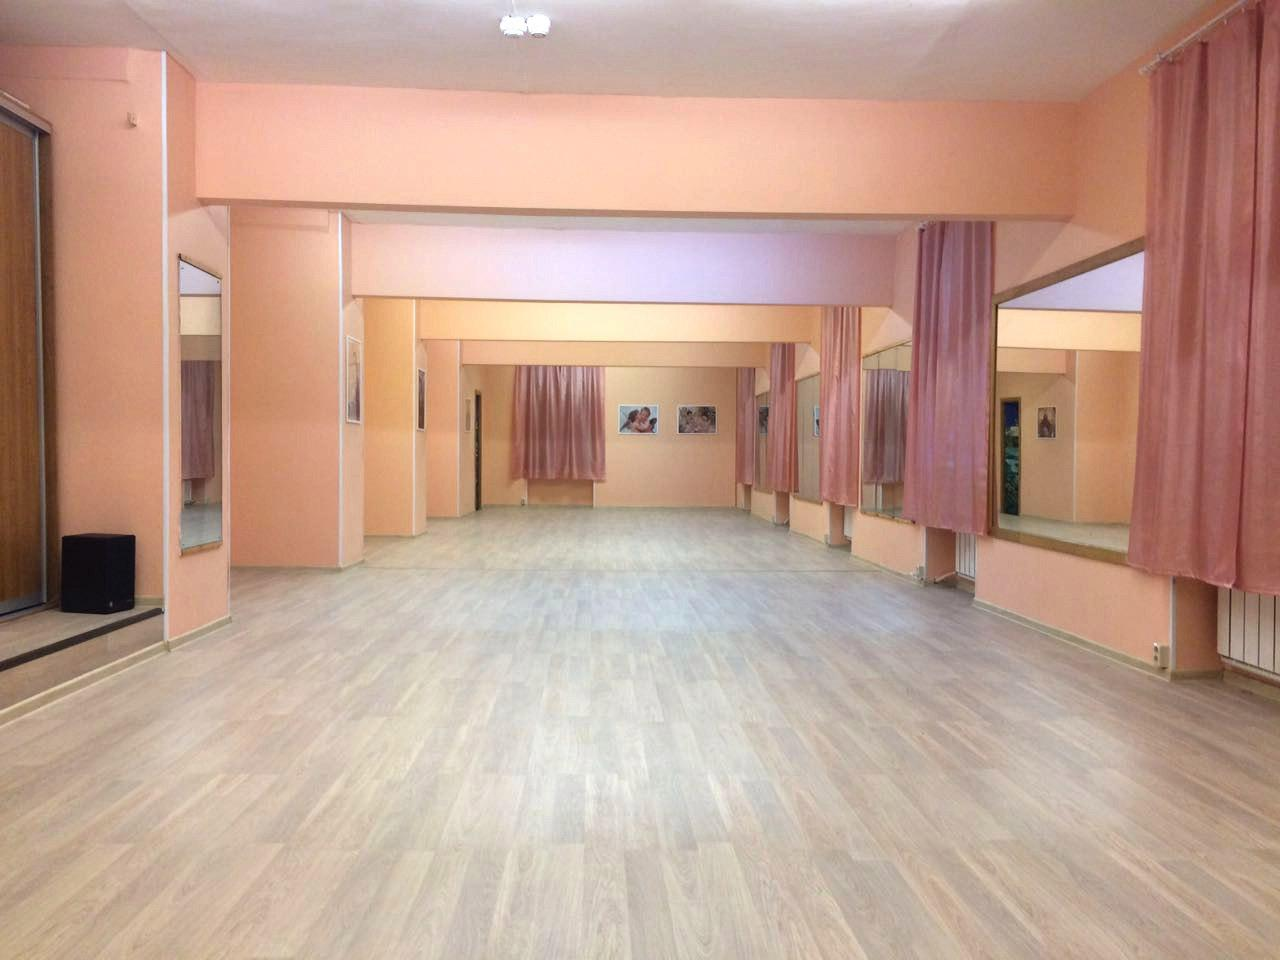 Школа танцев Viva La Danza в ЮЗАО Москвы